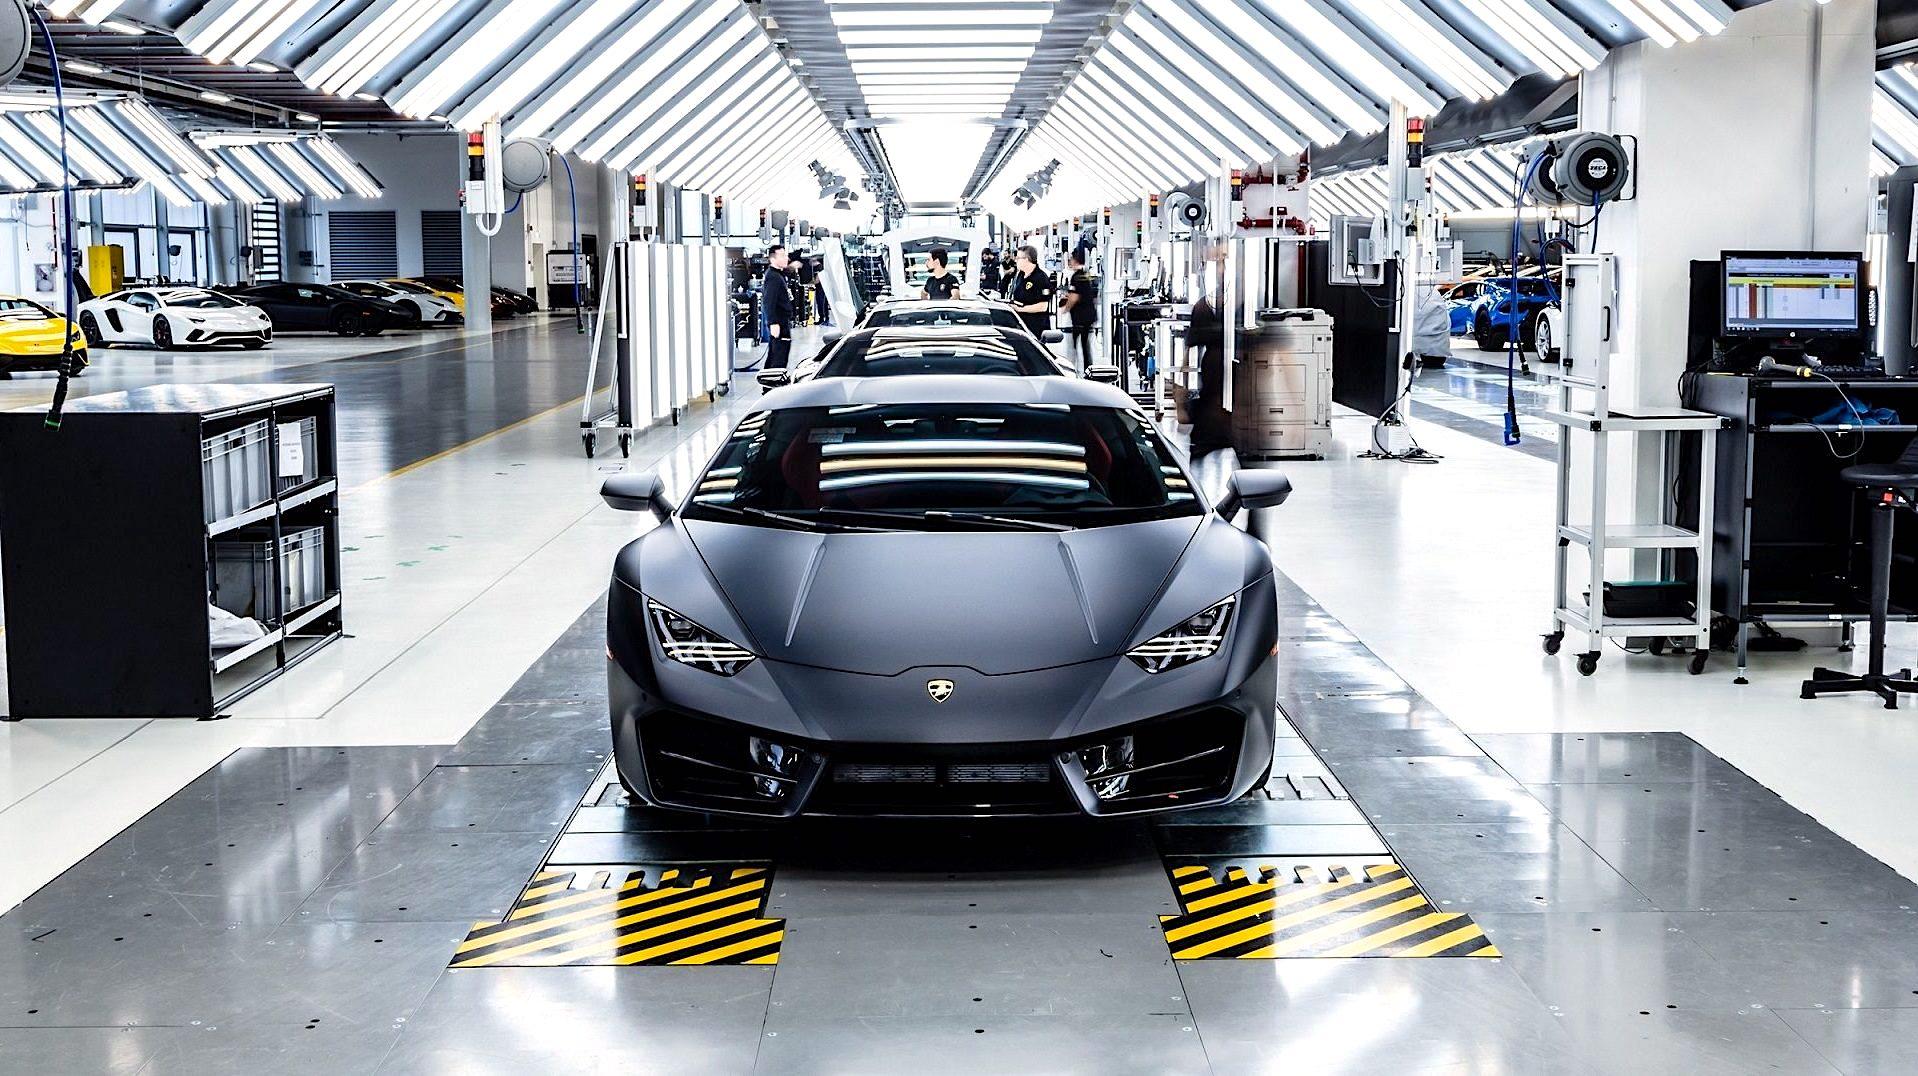 Lamborghini Factory (Sant'Agata Bolognese)